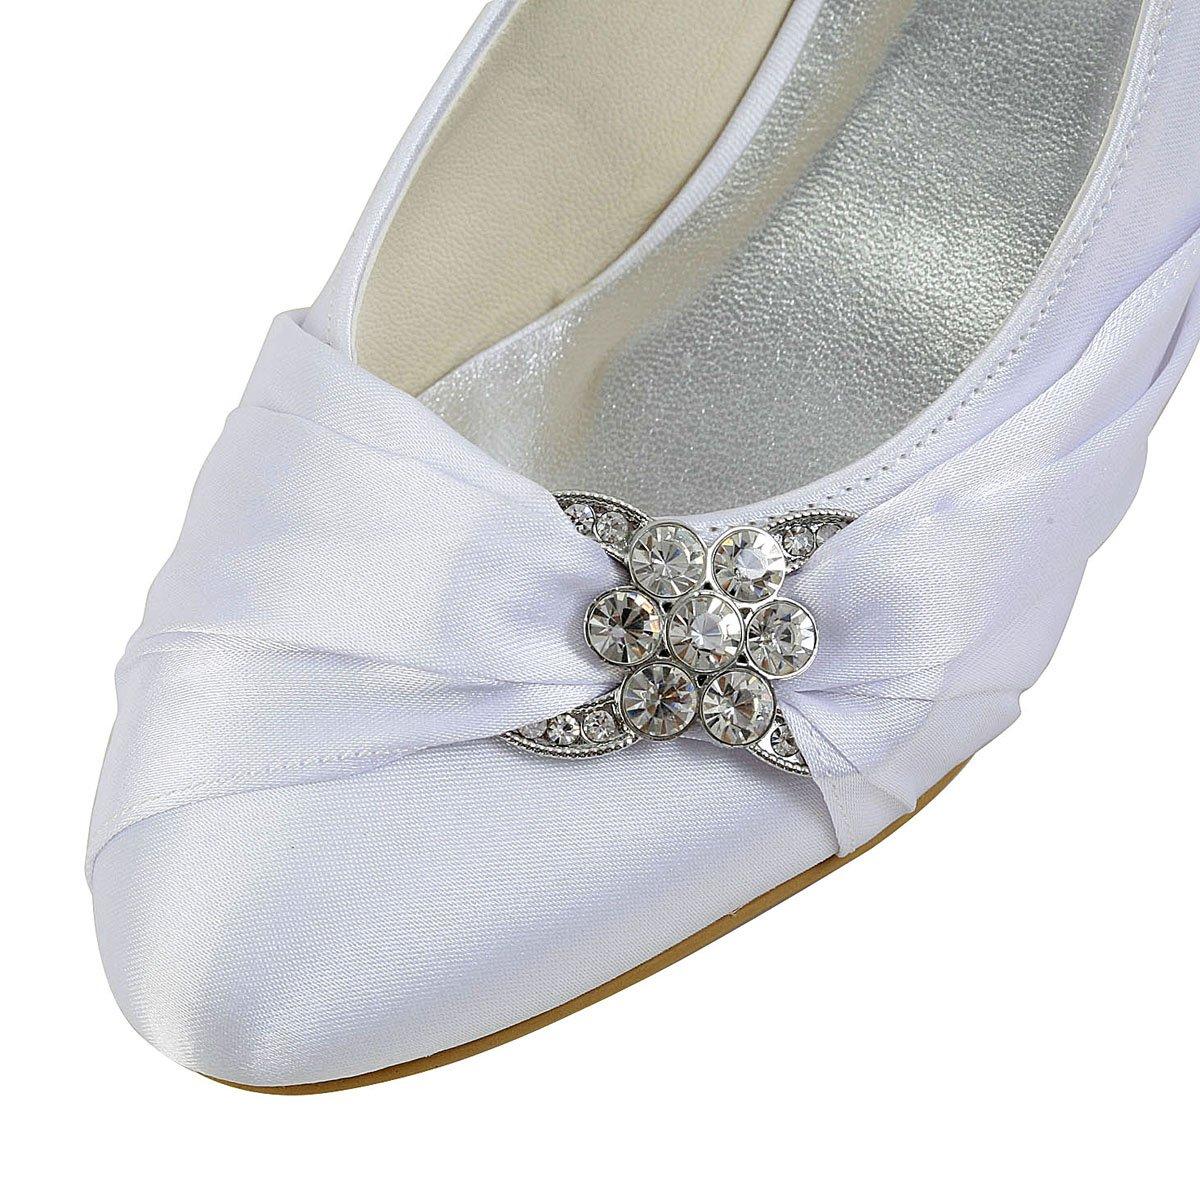 ElegantPark EP2006L chiuse Scarpe da sposa tacco basse scarpe chiuse EP2006L donna Bianco 5e2d5f